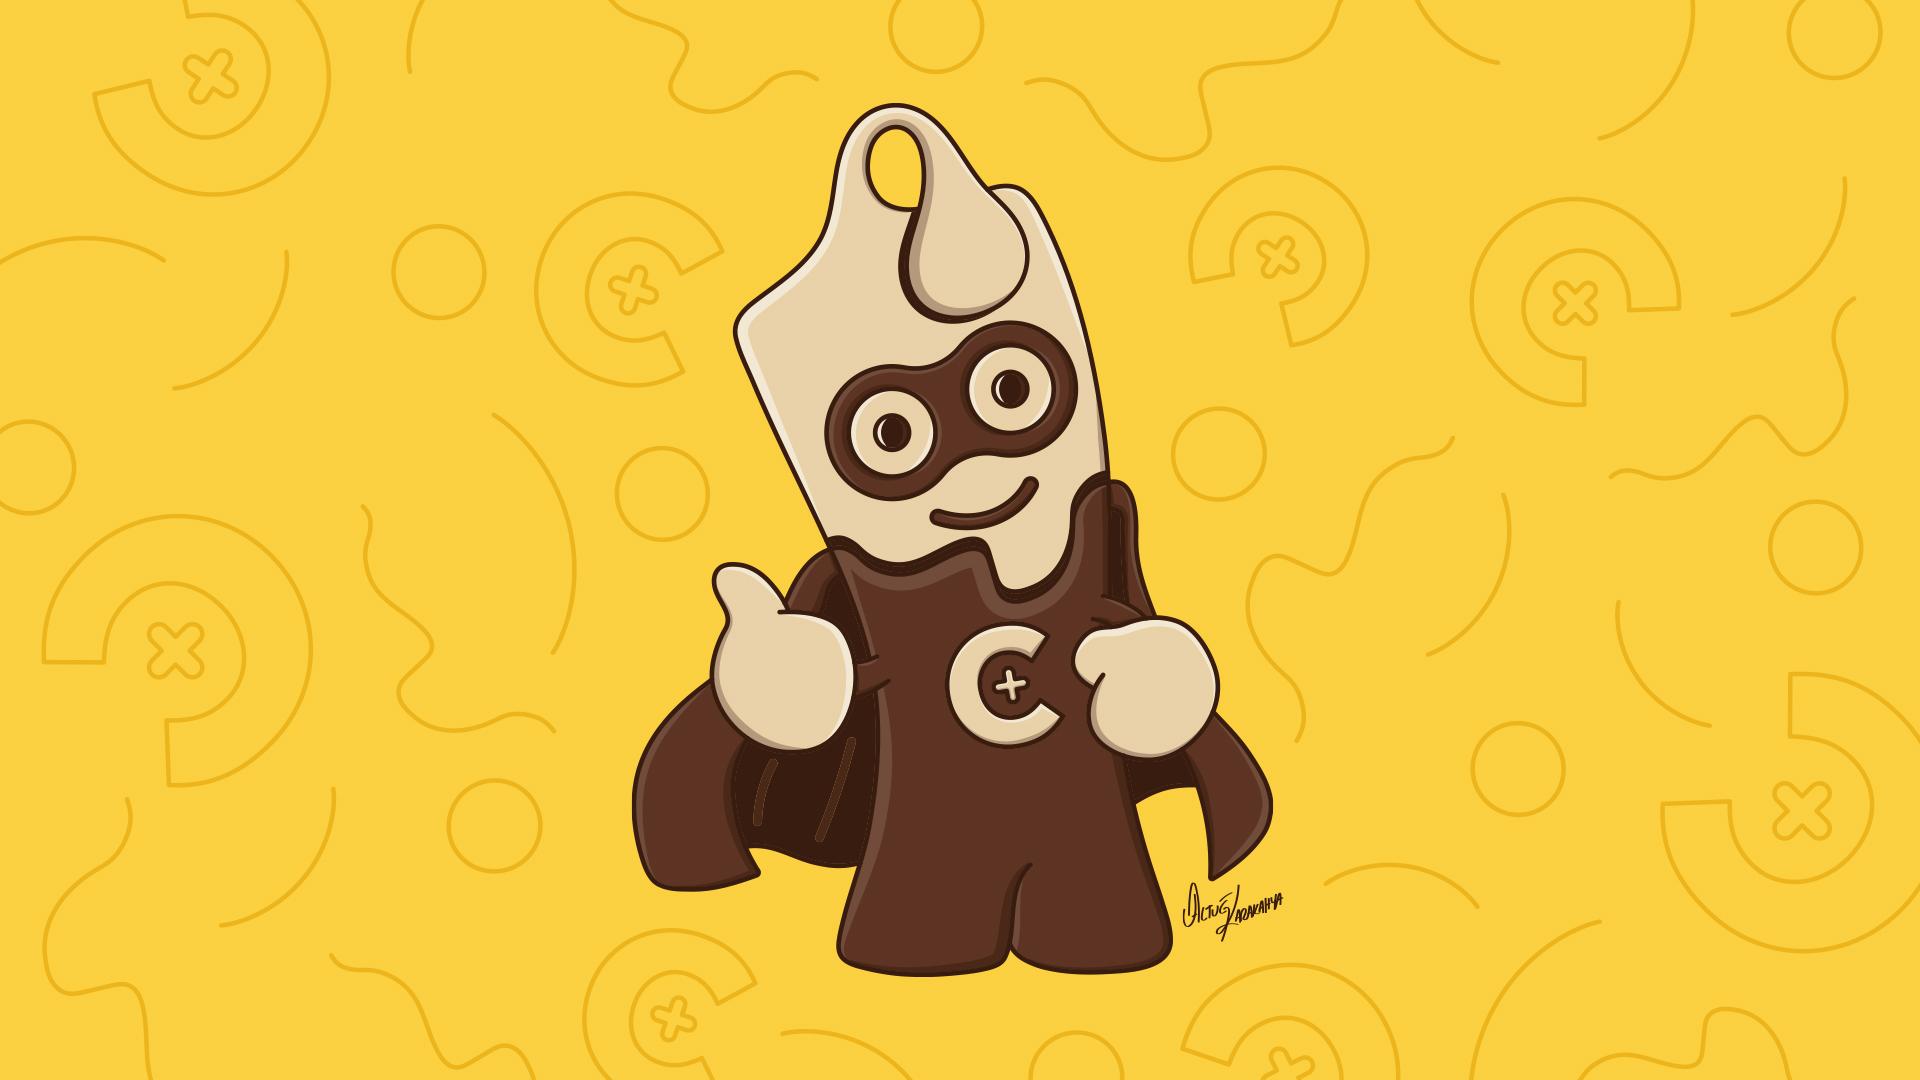 ChocoDoc